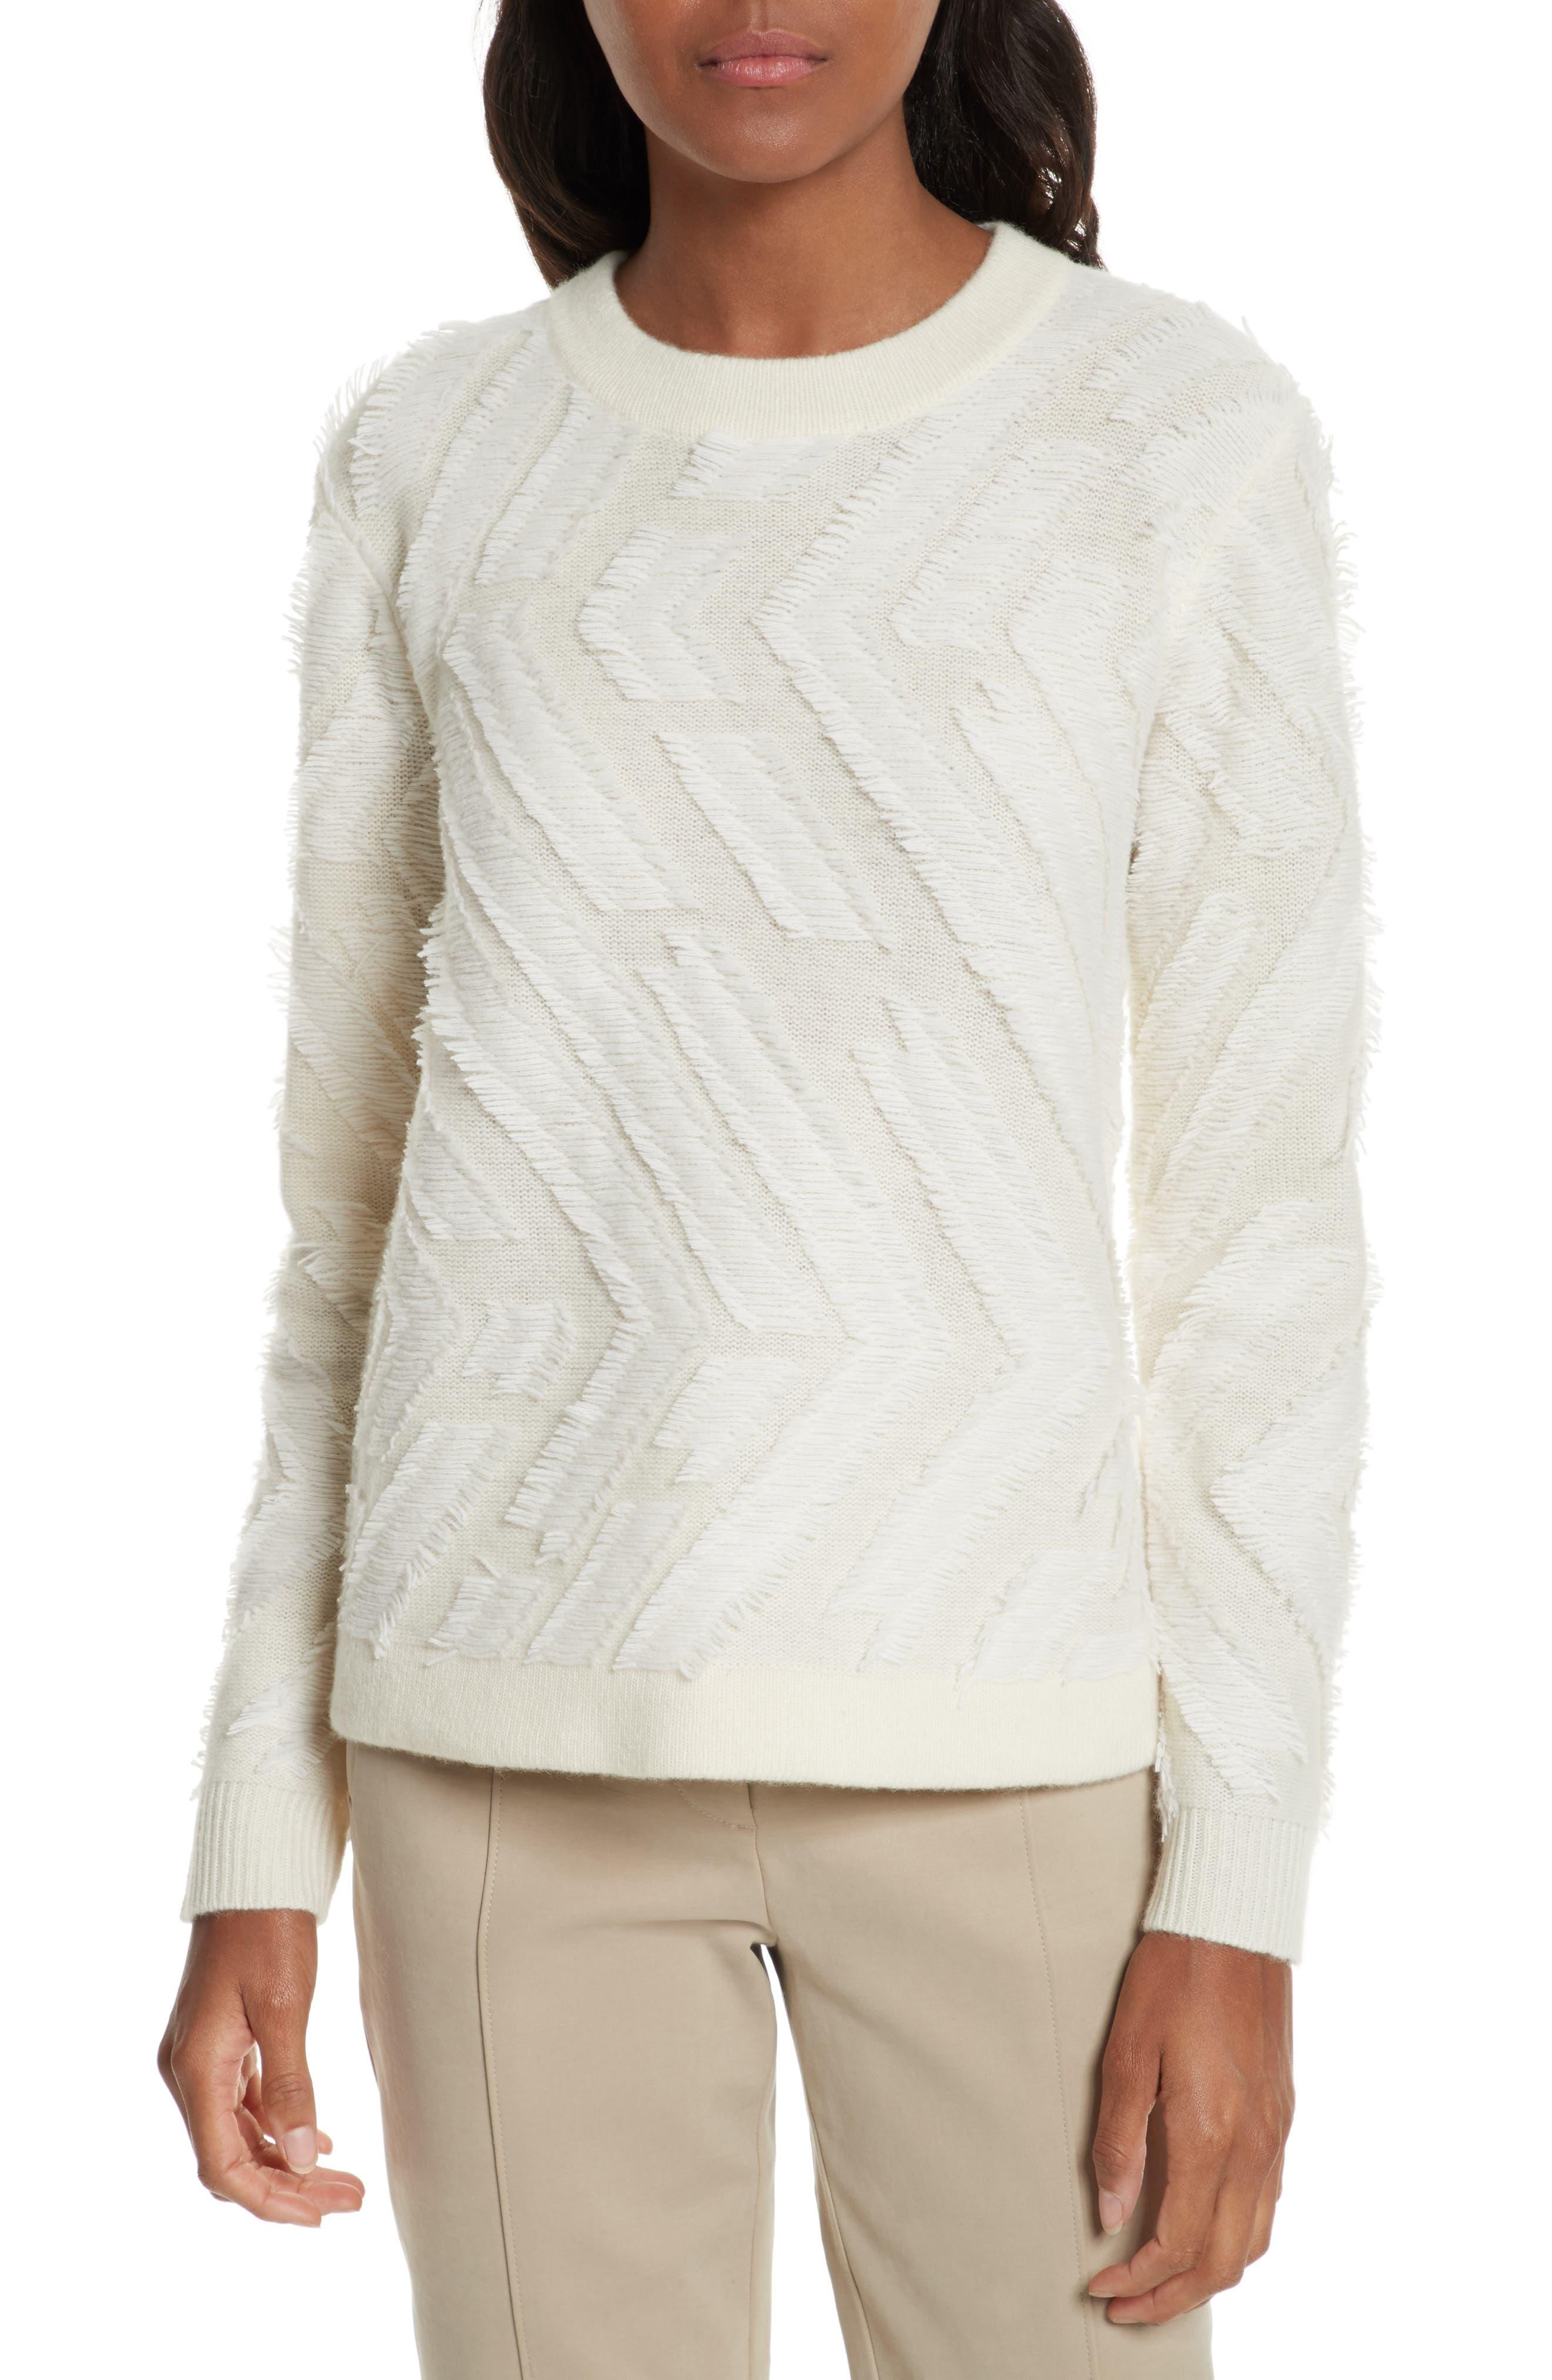 Main Image - Tory Burch Weston Textured Wool Sweater